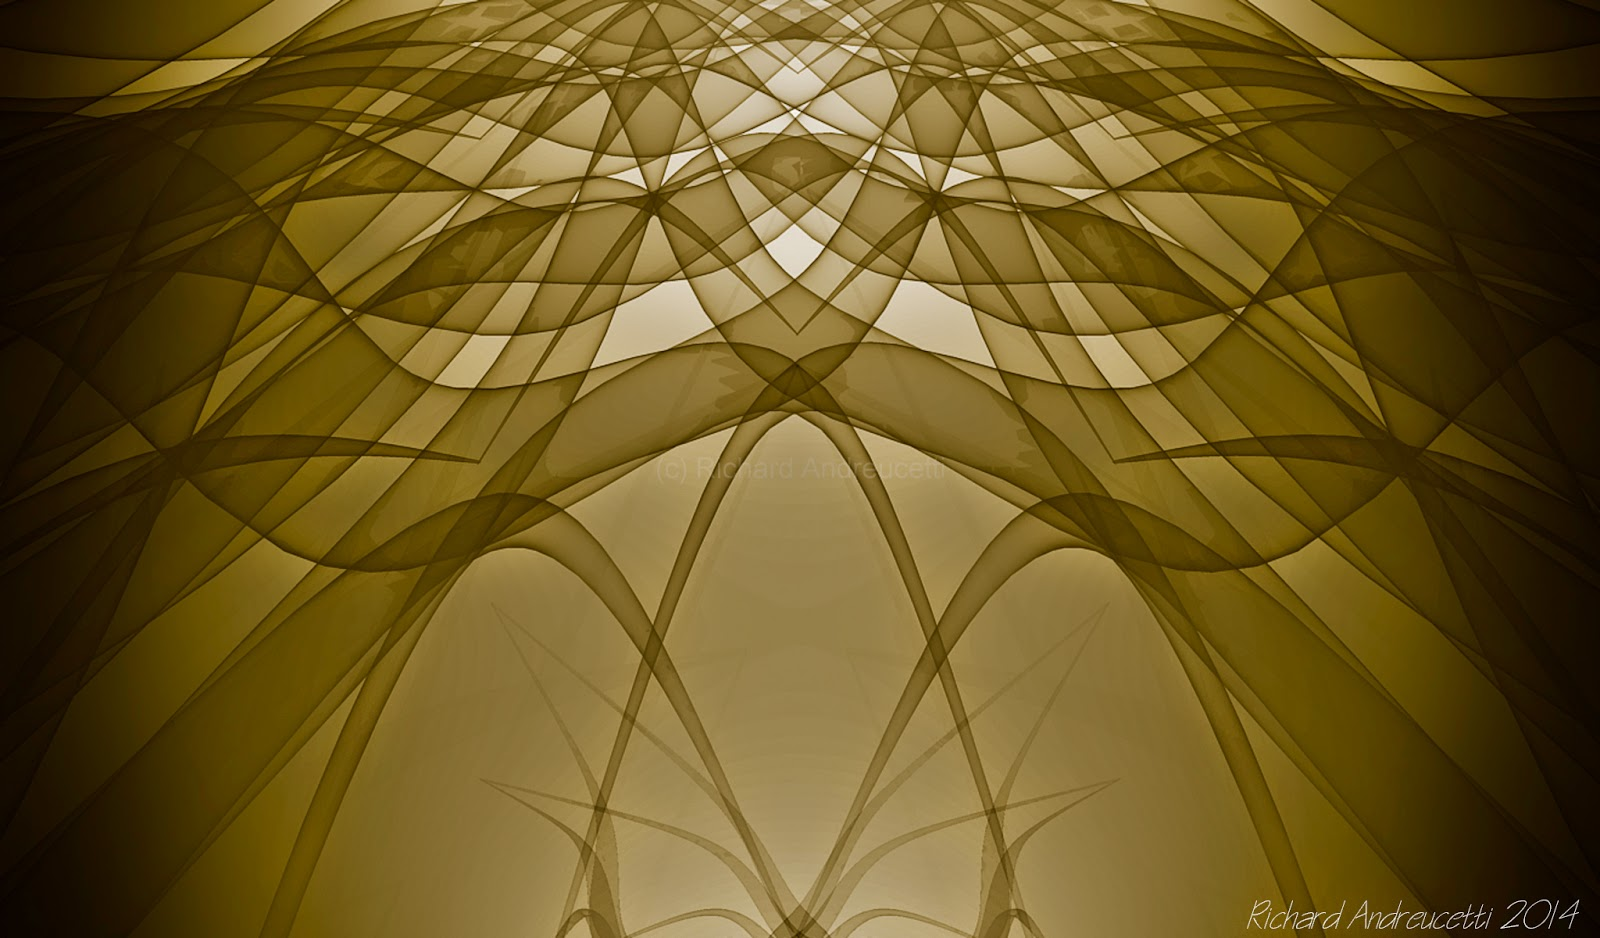 Irish abstract artists